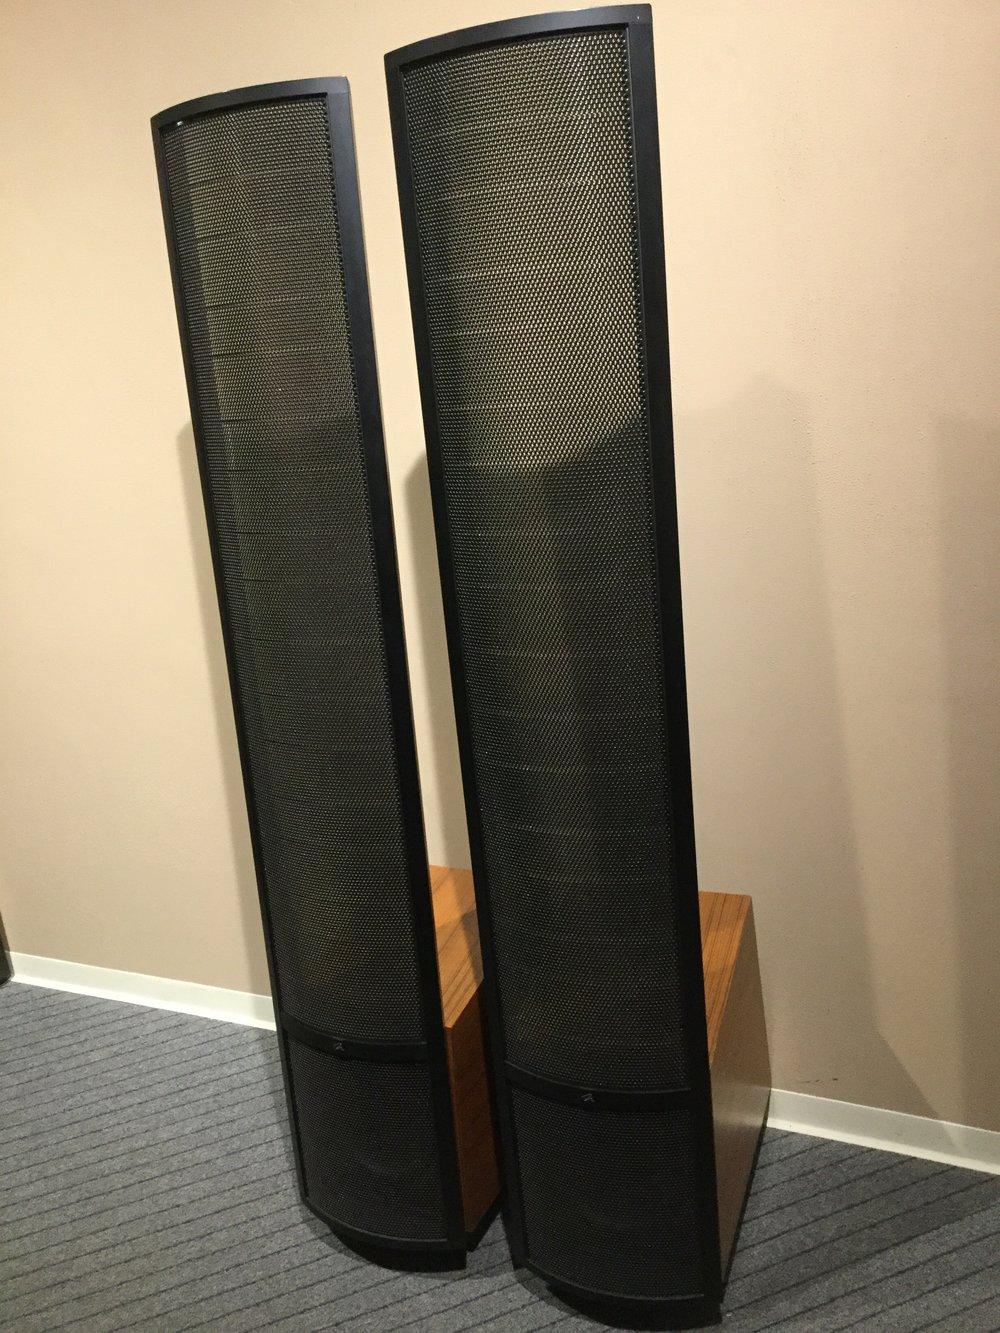 Martin Logan Ethos $3,199 Floor model full warranty